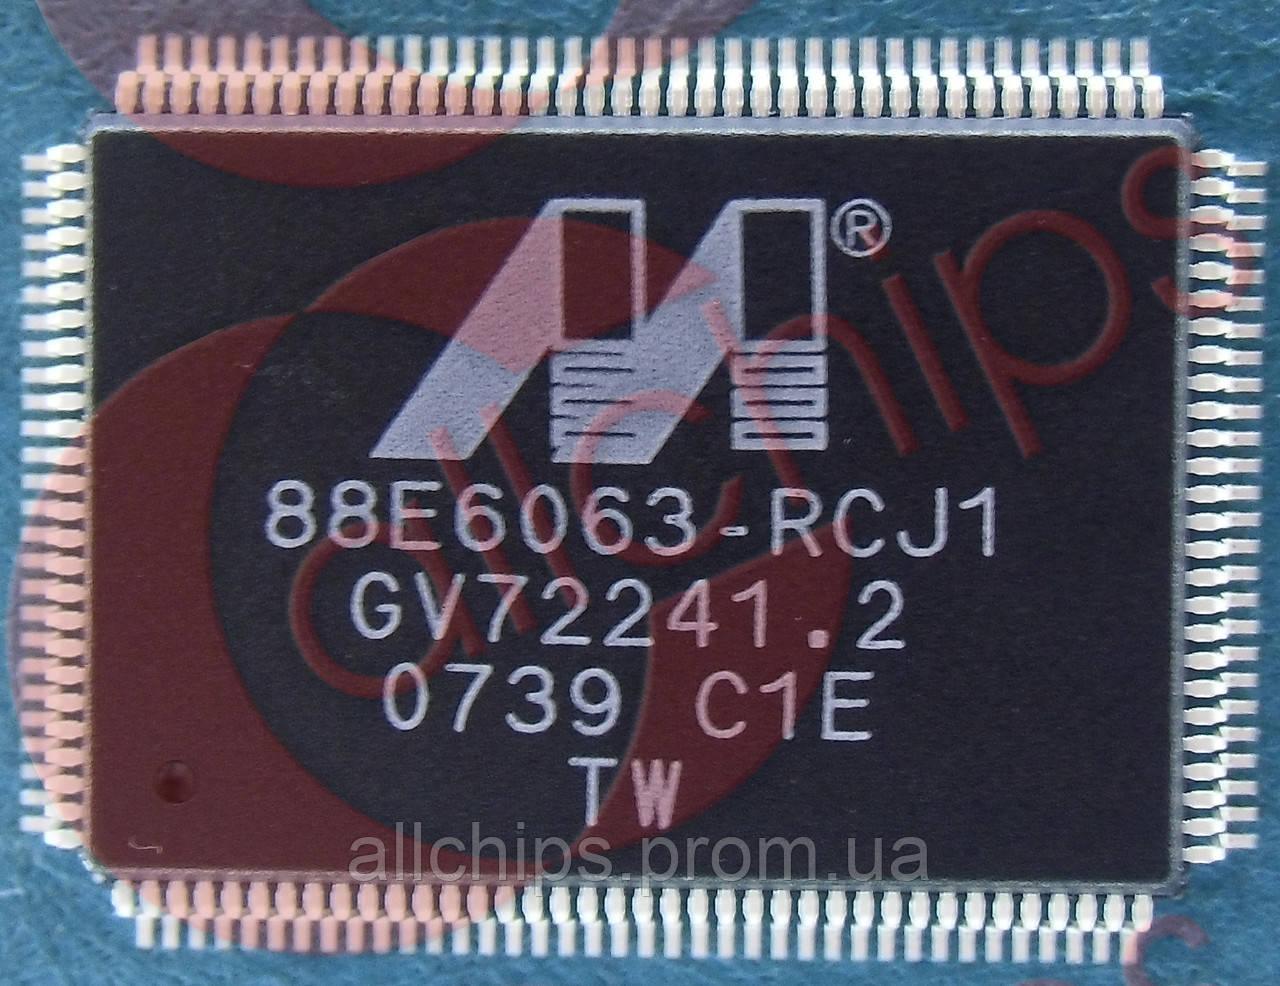 Ethernet 7 Marvell 88E6063 RCJ1 QFP